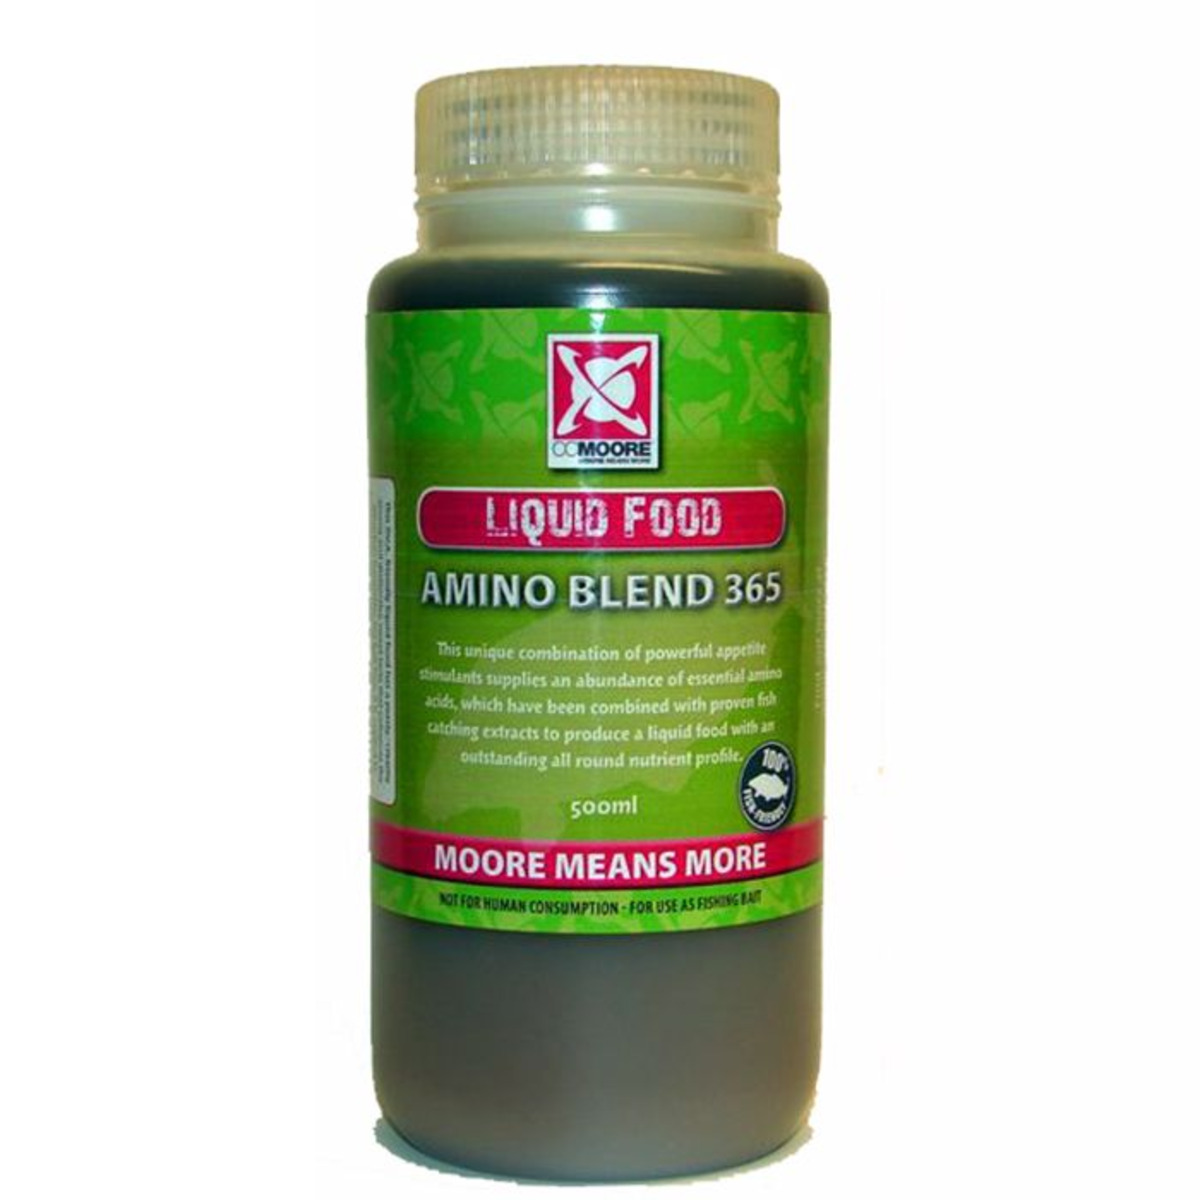 CC Moore Amino Blend 365 Liquid - 500 ml